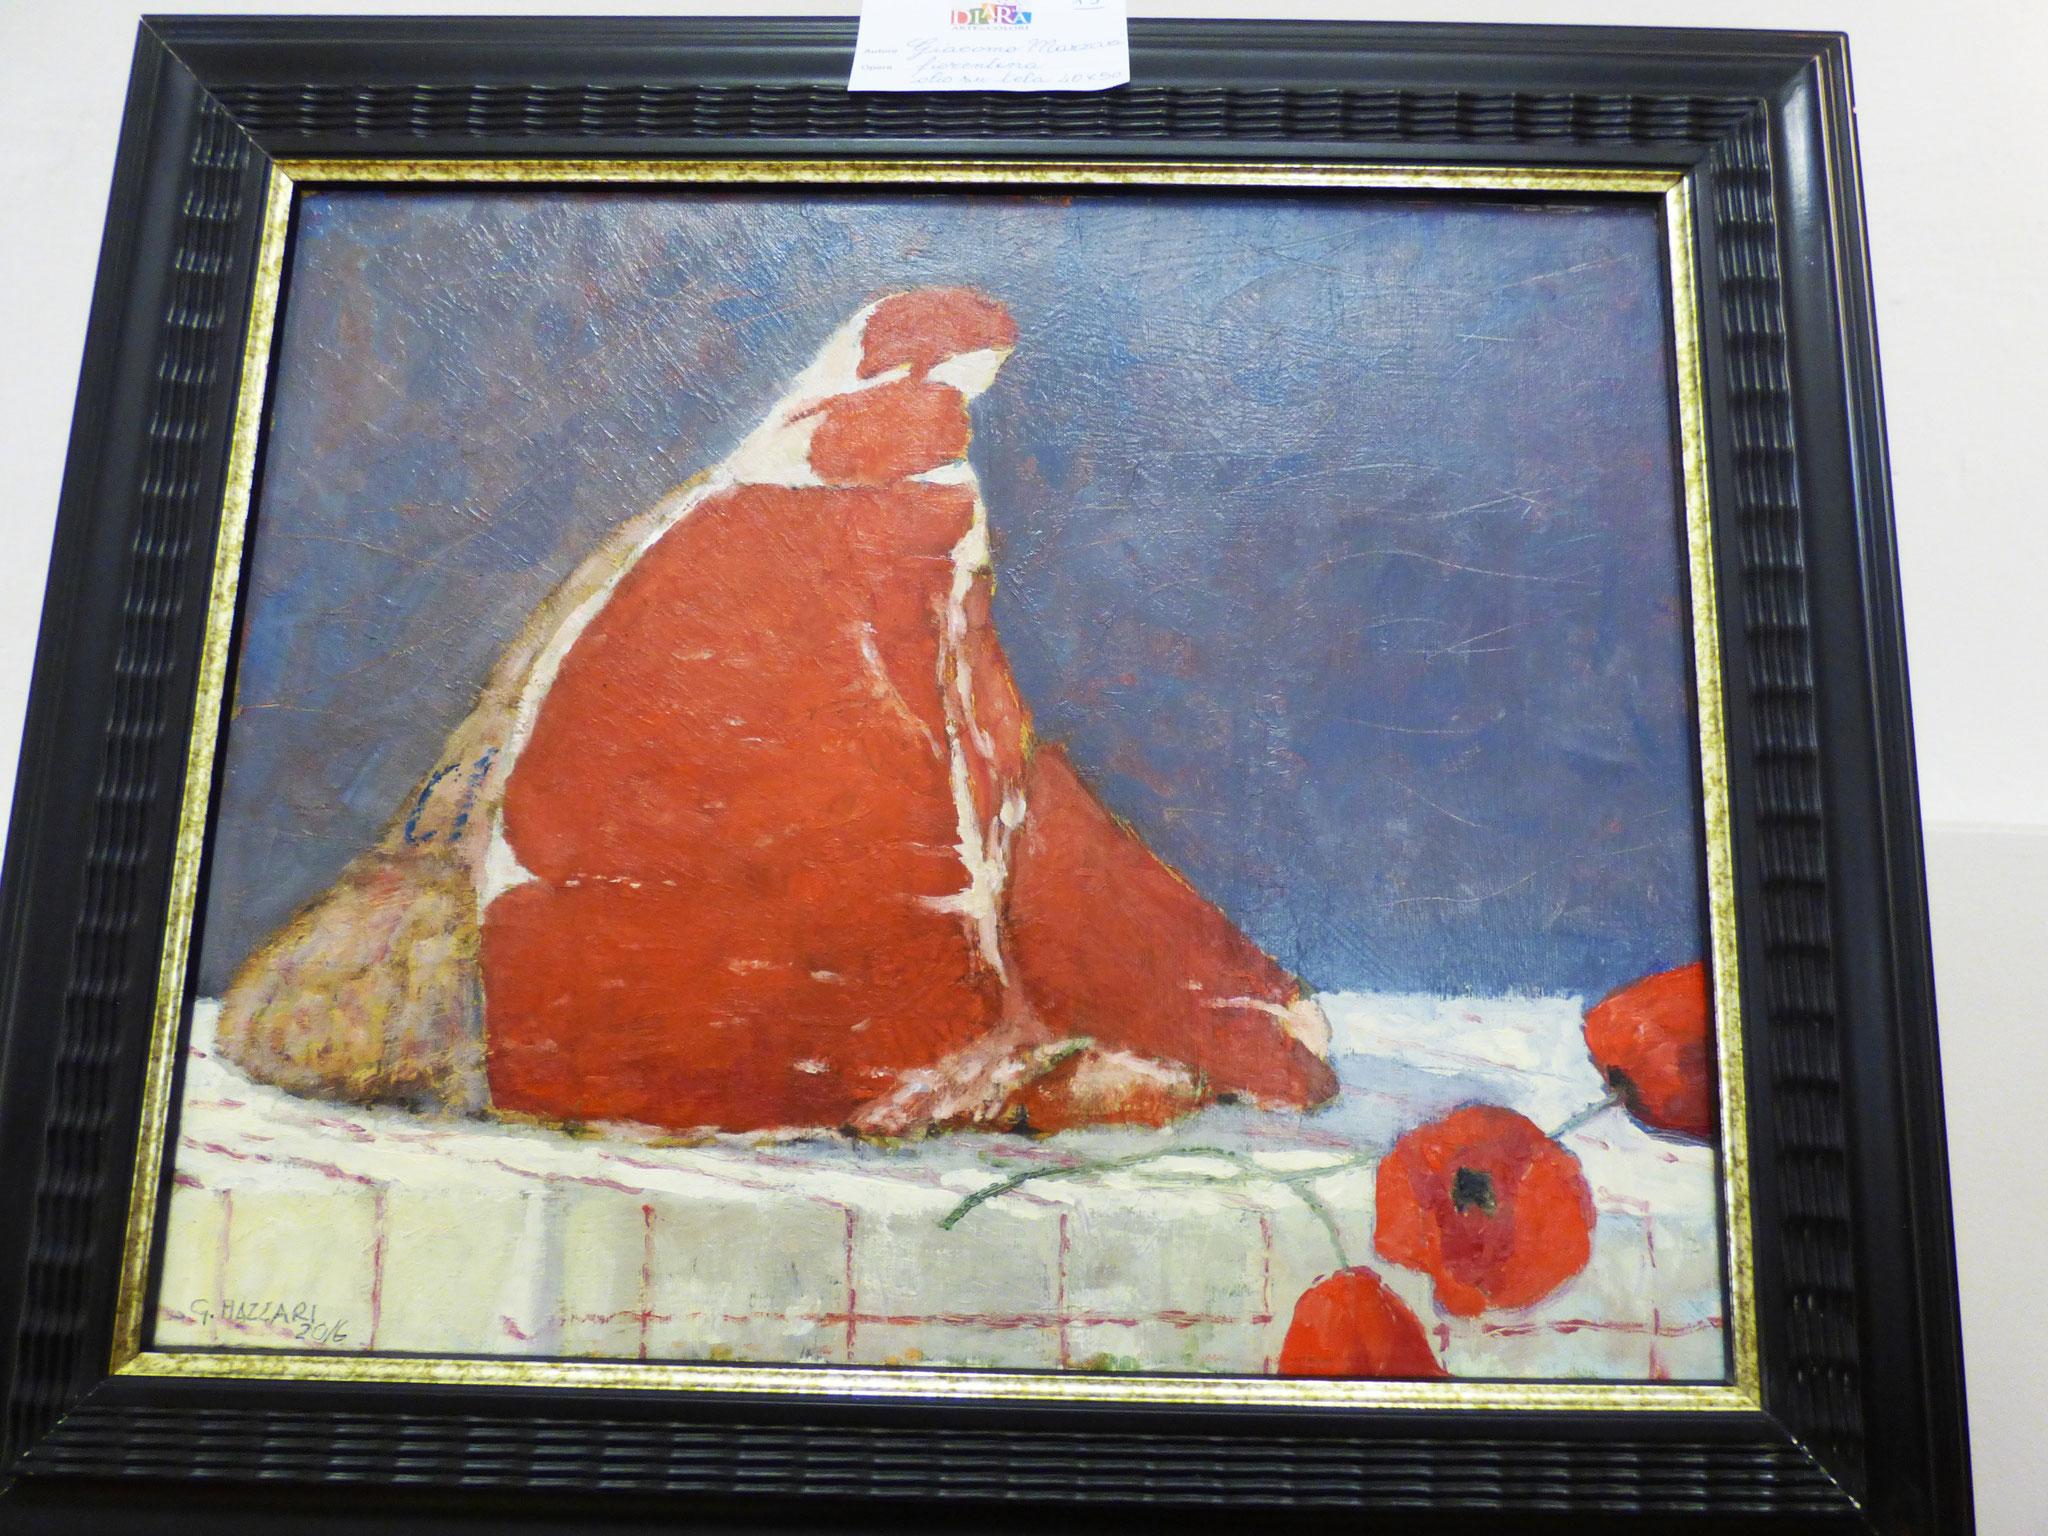 Giacomo Mazzari fiorentina olio su tela 40x50